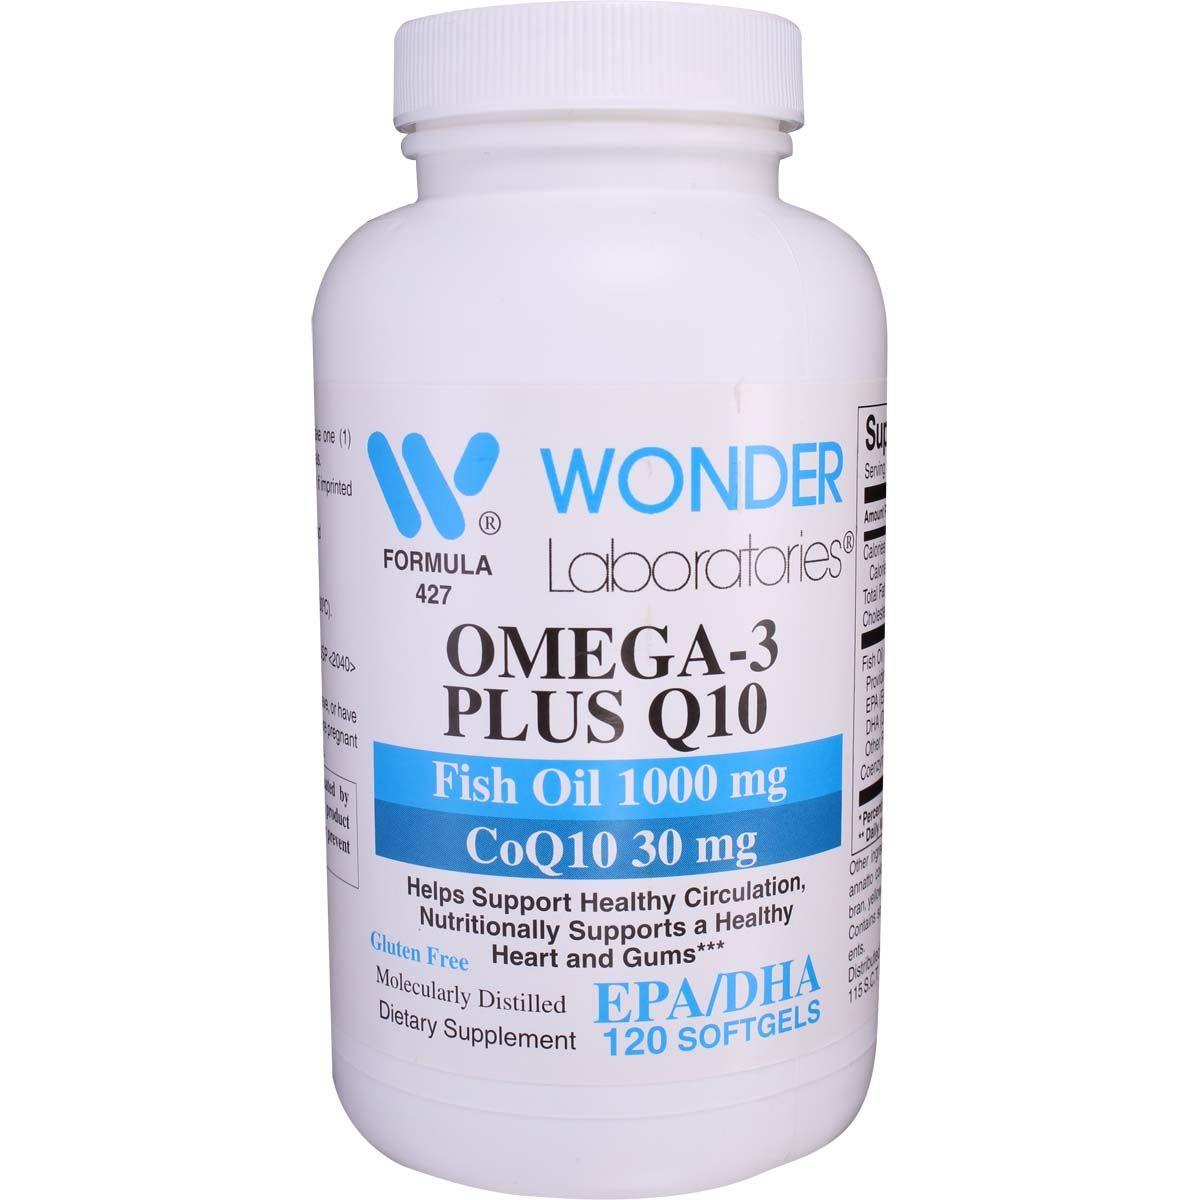 Omega 3 Plus Q10 Fish Oil 1000 Mg Coq10 30 Mg 120 Softgels Wonderlabs Vitamins Nutrition Supplements Vitamins